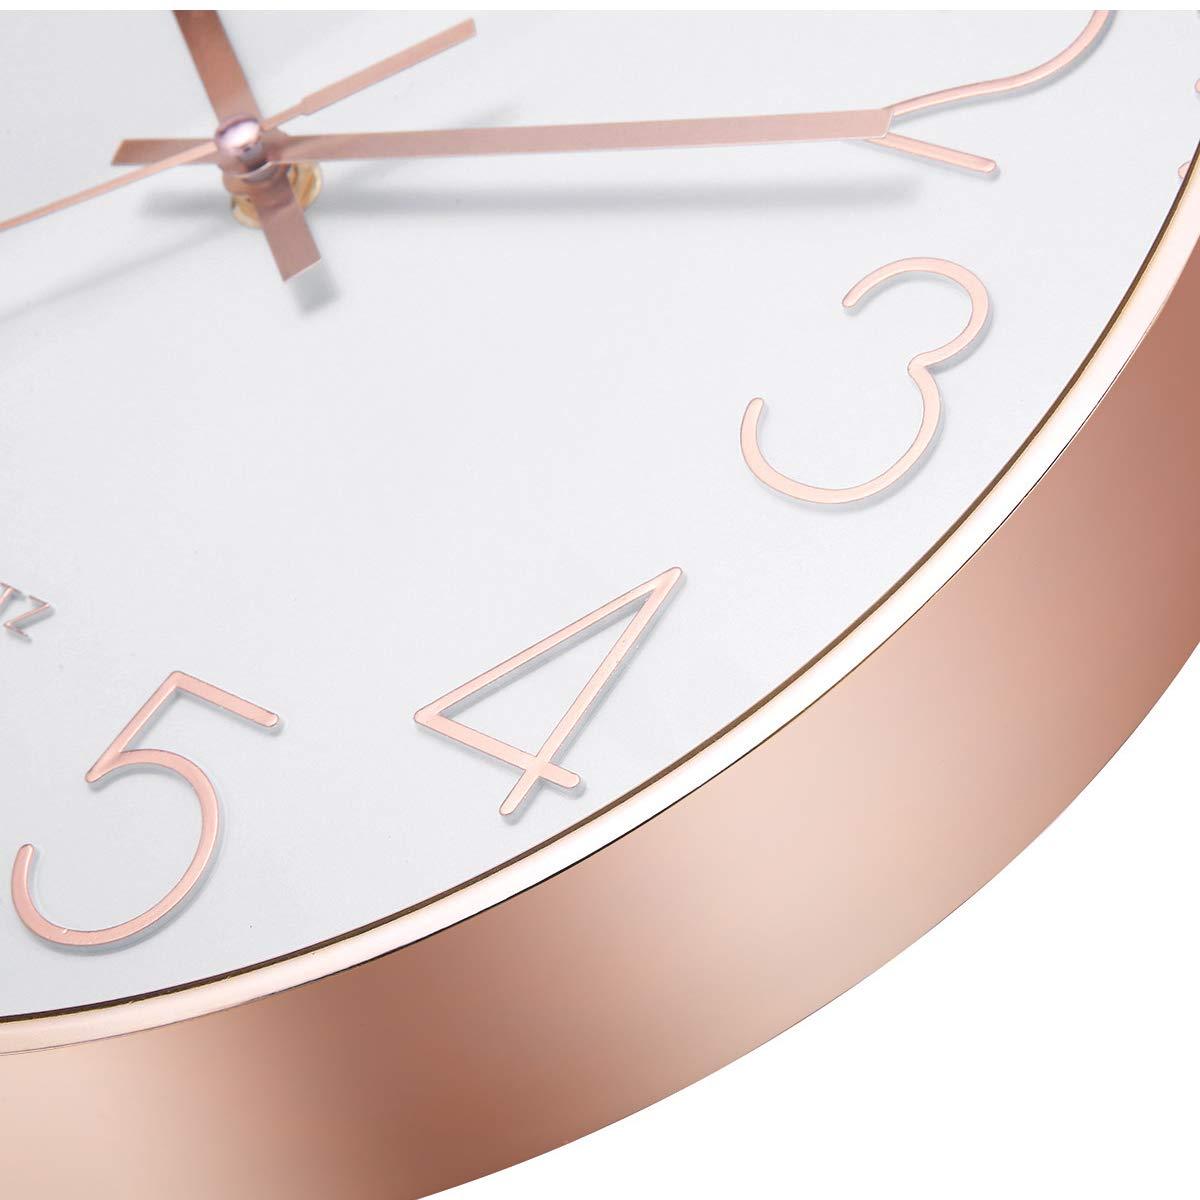 Jeteven 12\'\' Rose Gold Wall Clock Silent Non-ticking Wall Clock for Living Room Bedroom Decor